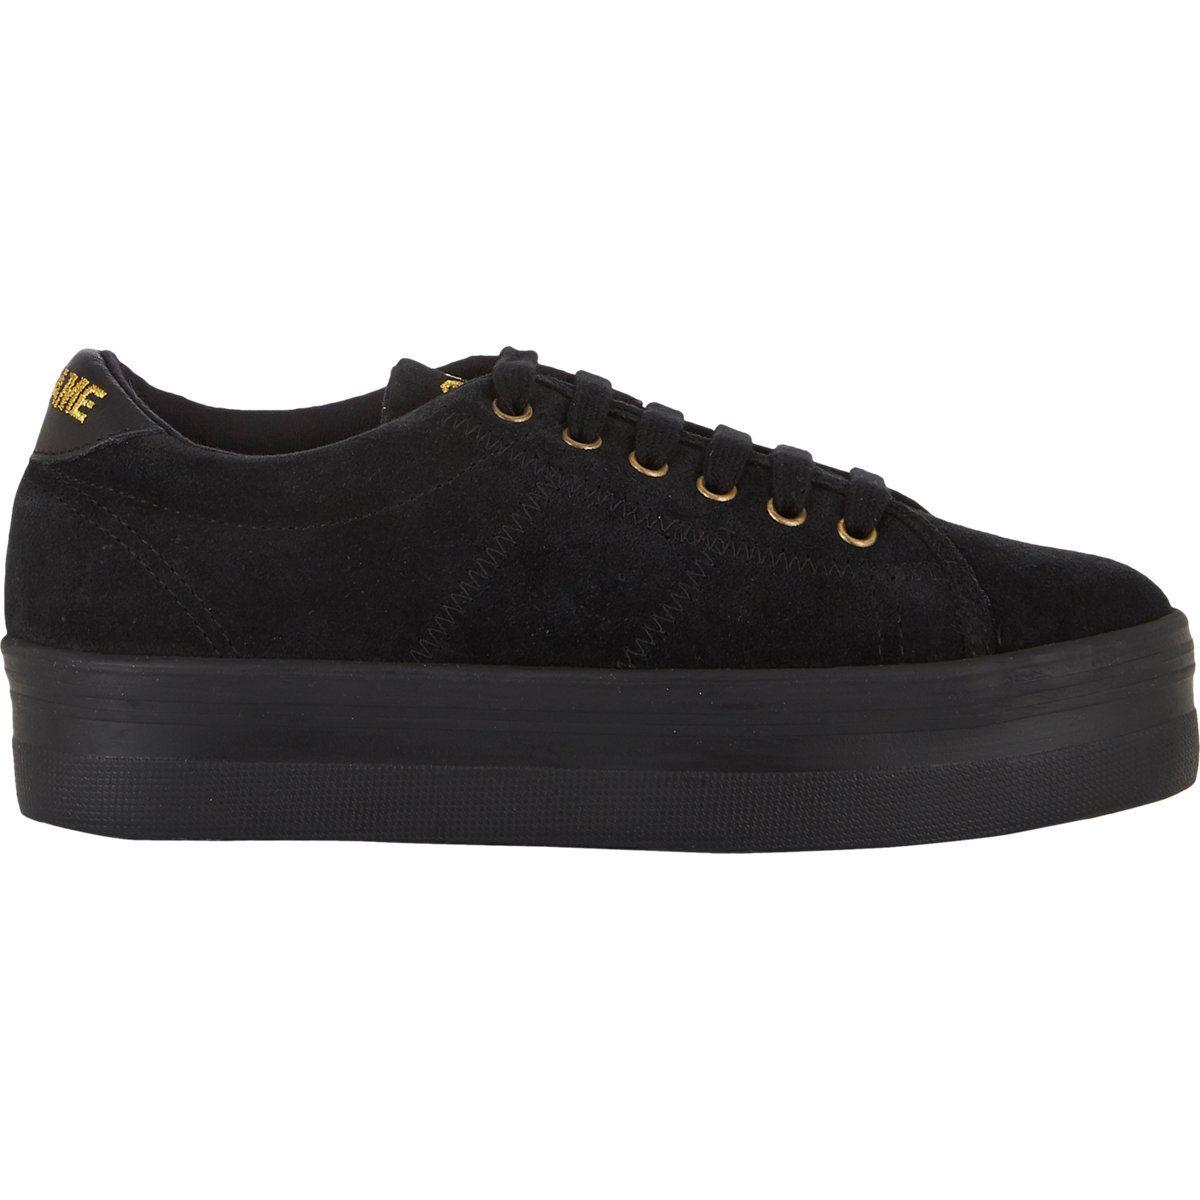 No Name Plato Platform Sneakers at Barneys.com